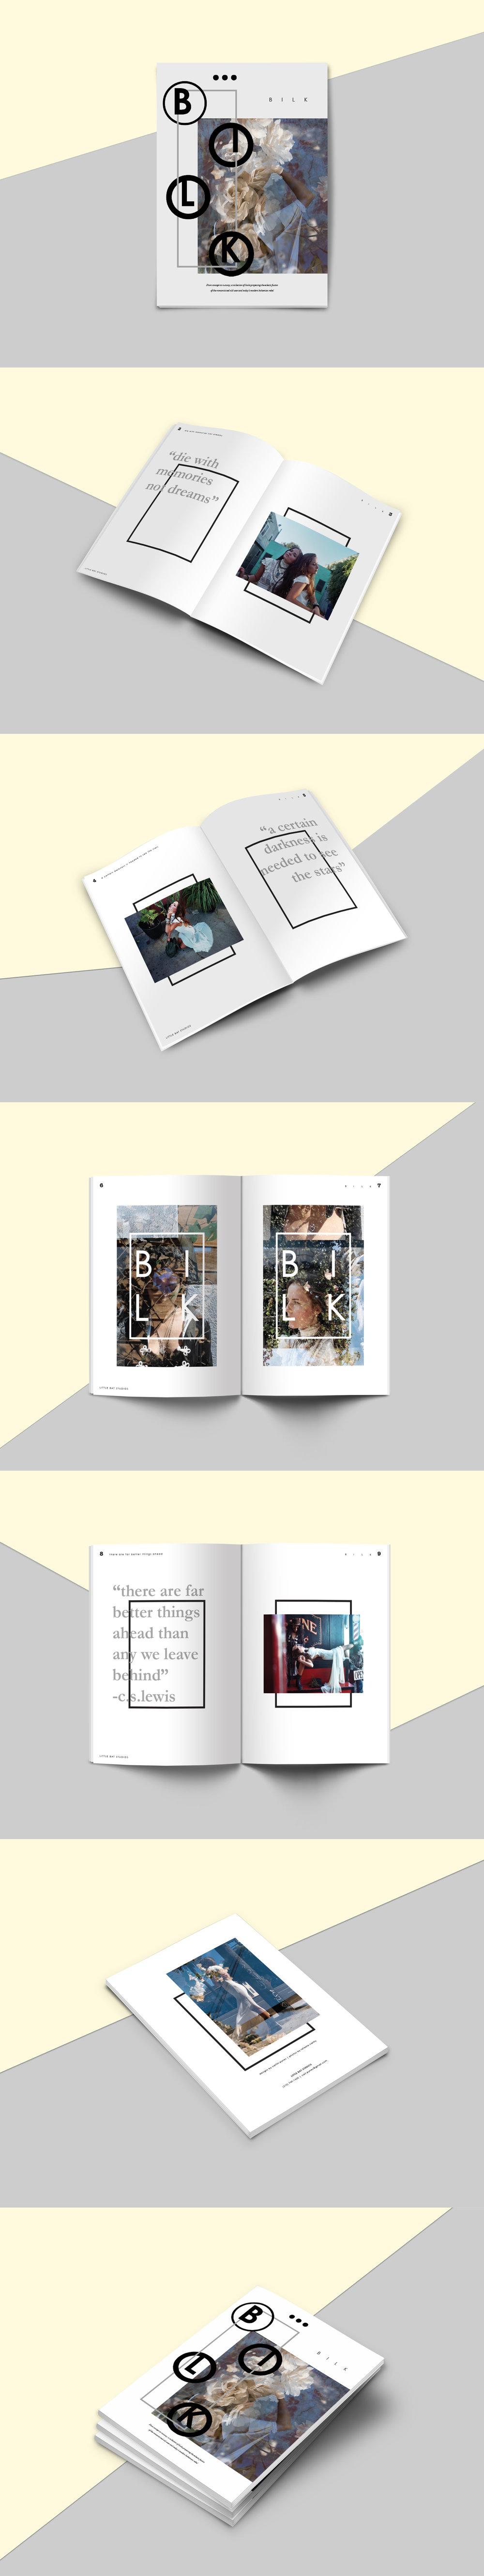 PVS-web-Bilk-LookBook.jpg